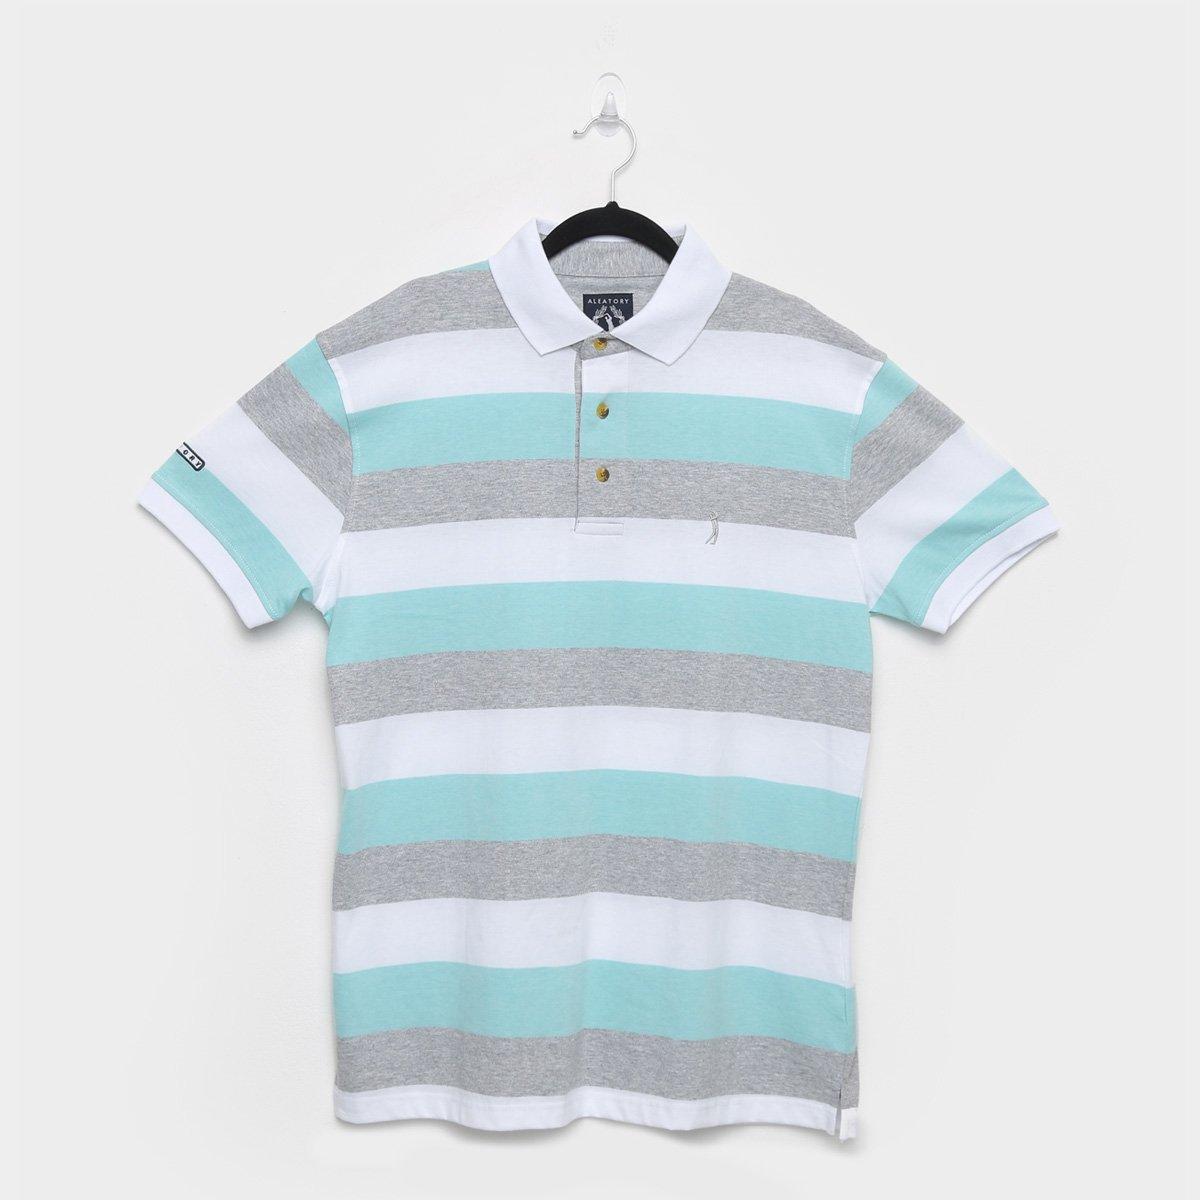 Camisa Polo Aleatory Fio Tinto Listras Masculina